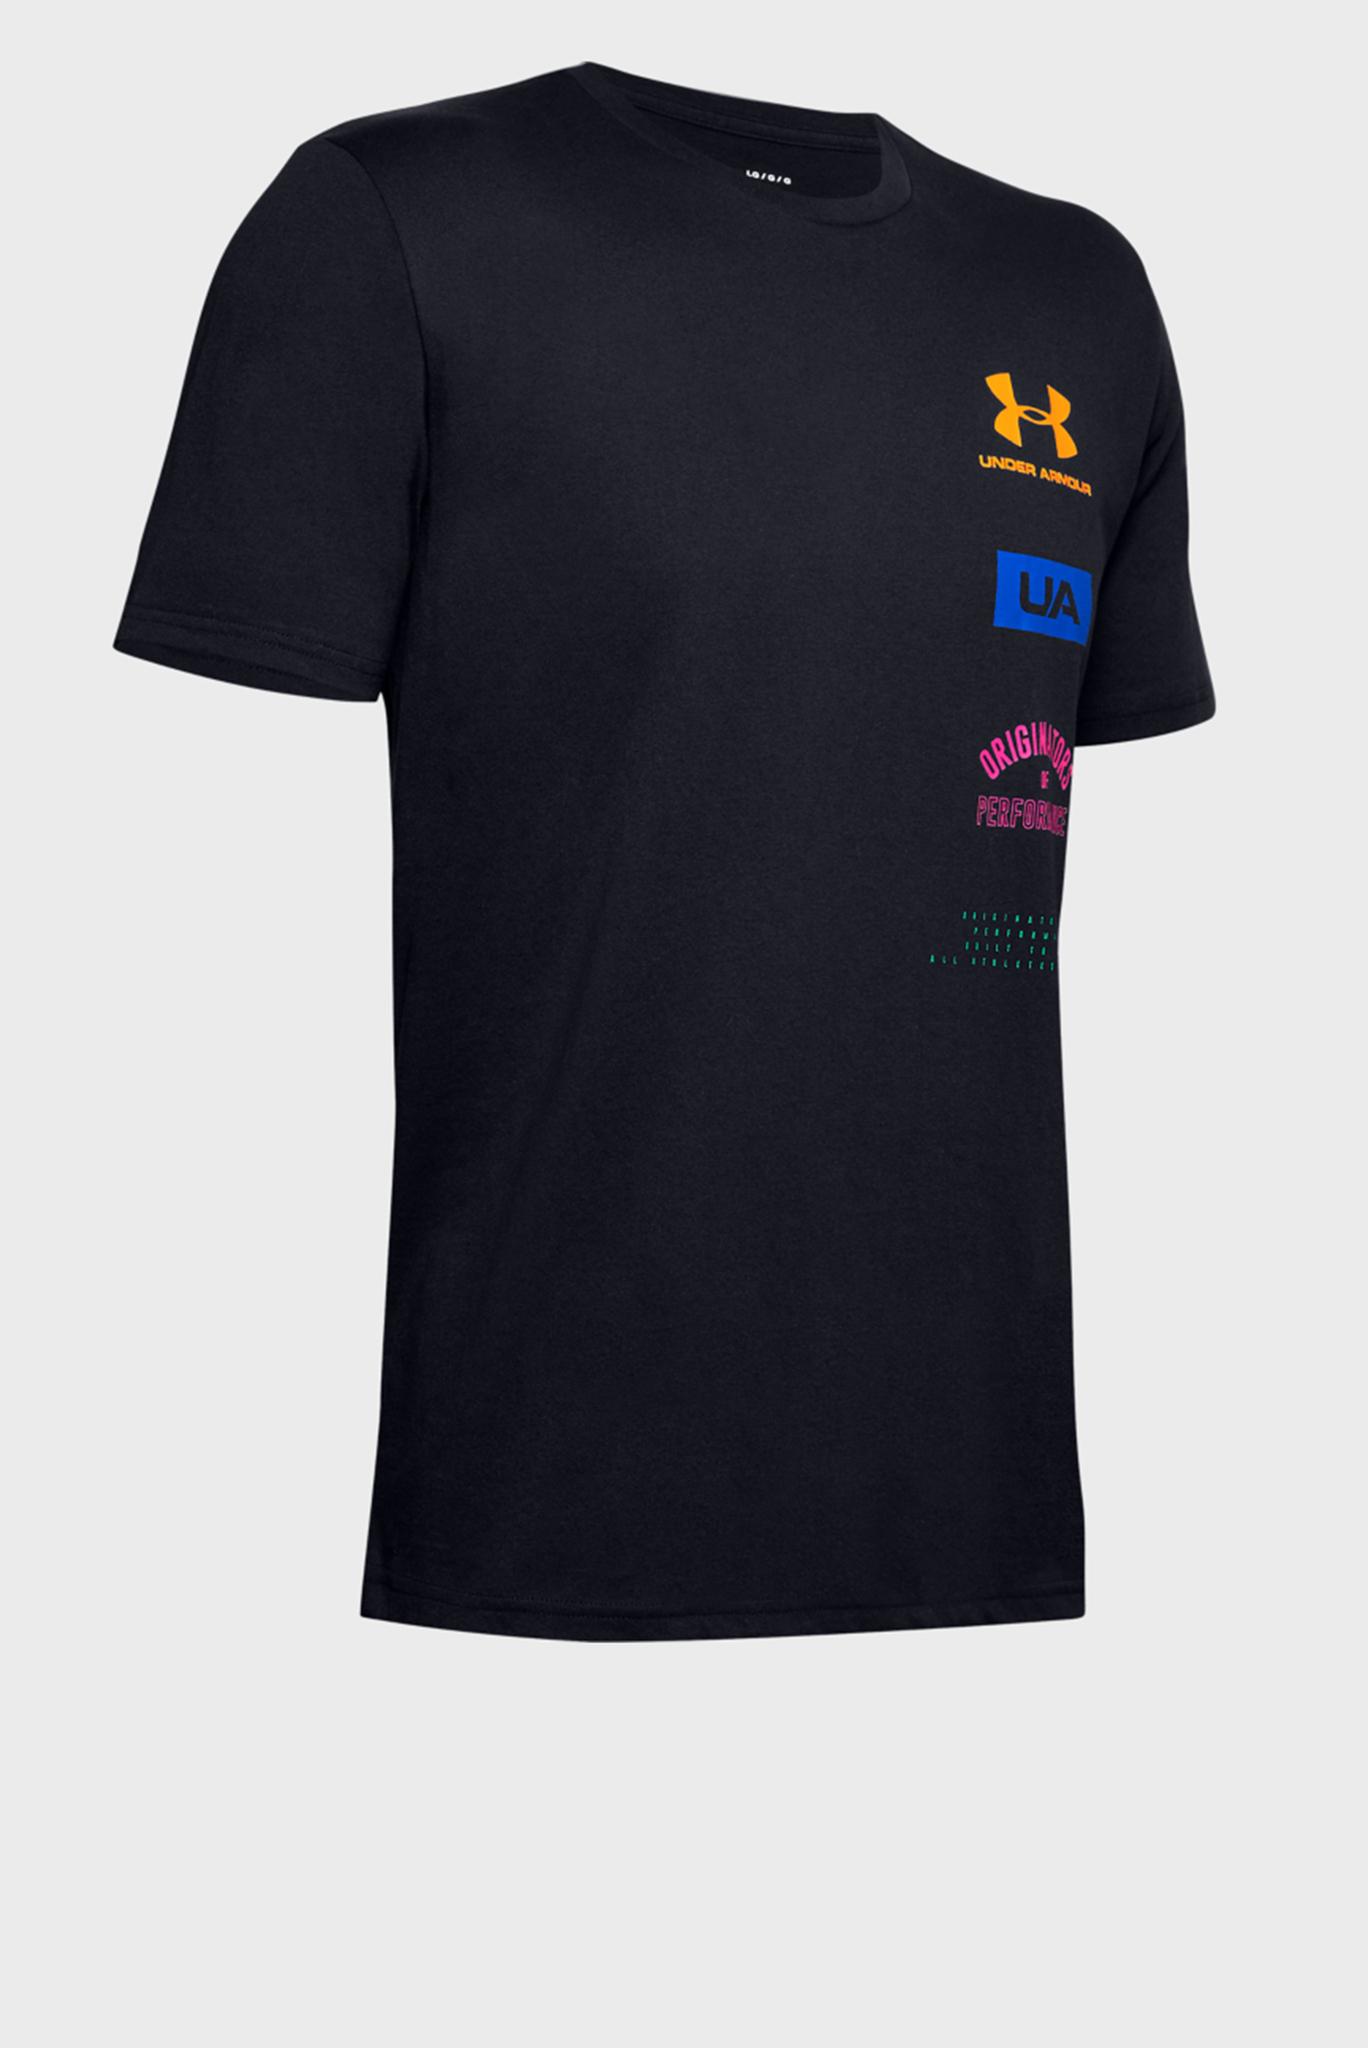 Мужская черная футболка UA PERF. ORIGIN BACK SS-BLK Under Armour